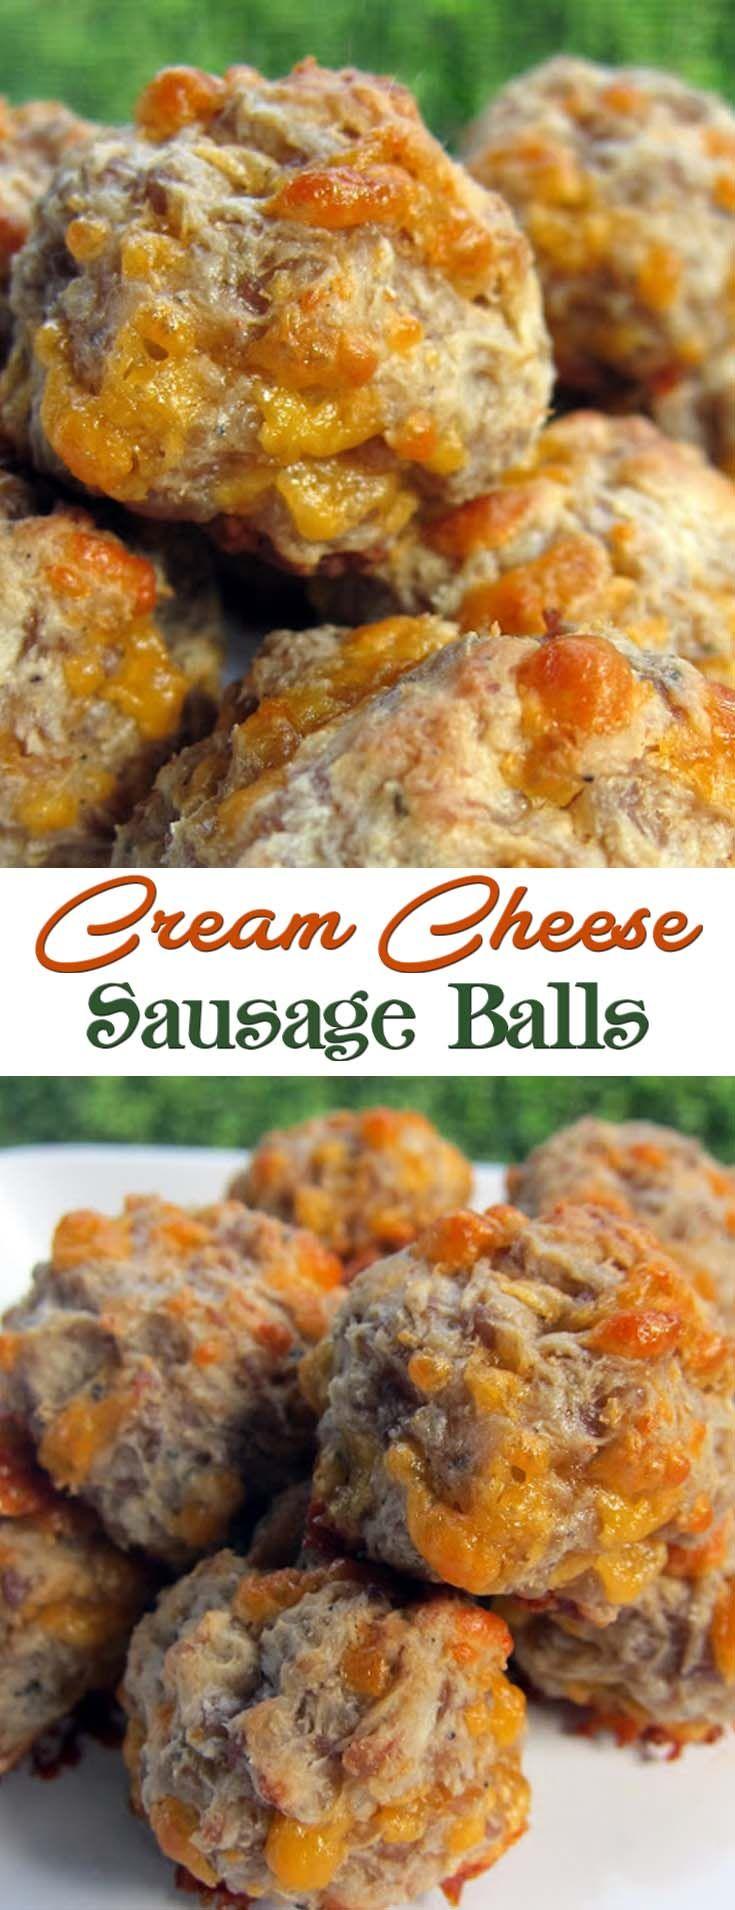 Easy Cream Cheese Sausage Balls                                                                                                                                                                                 More